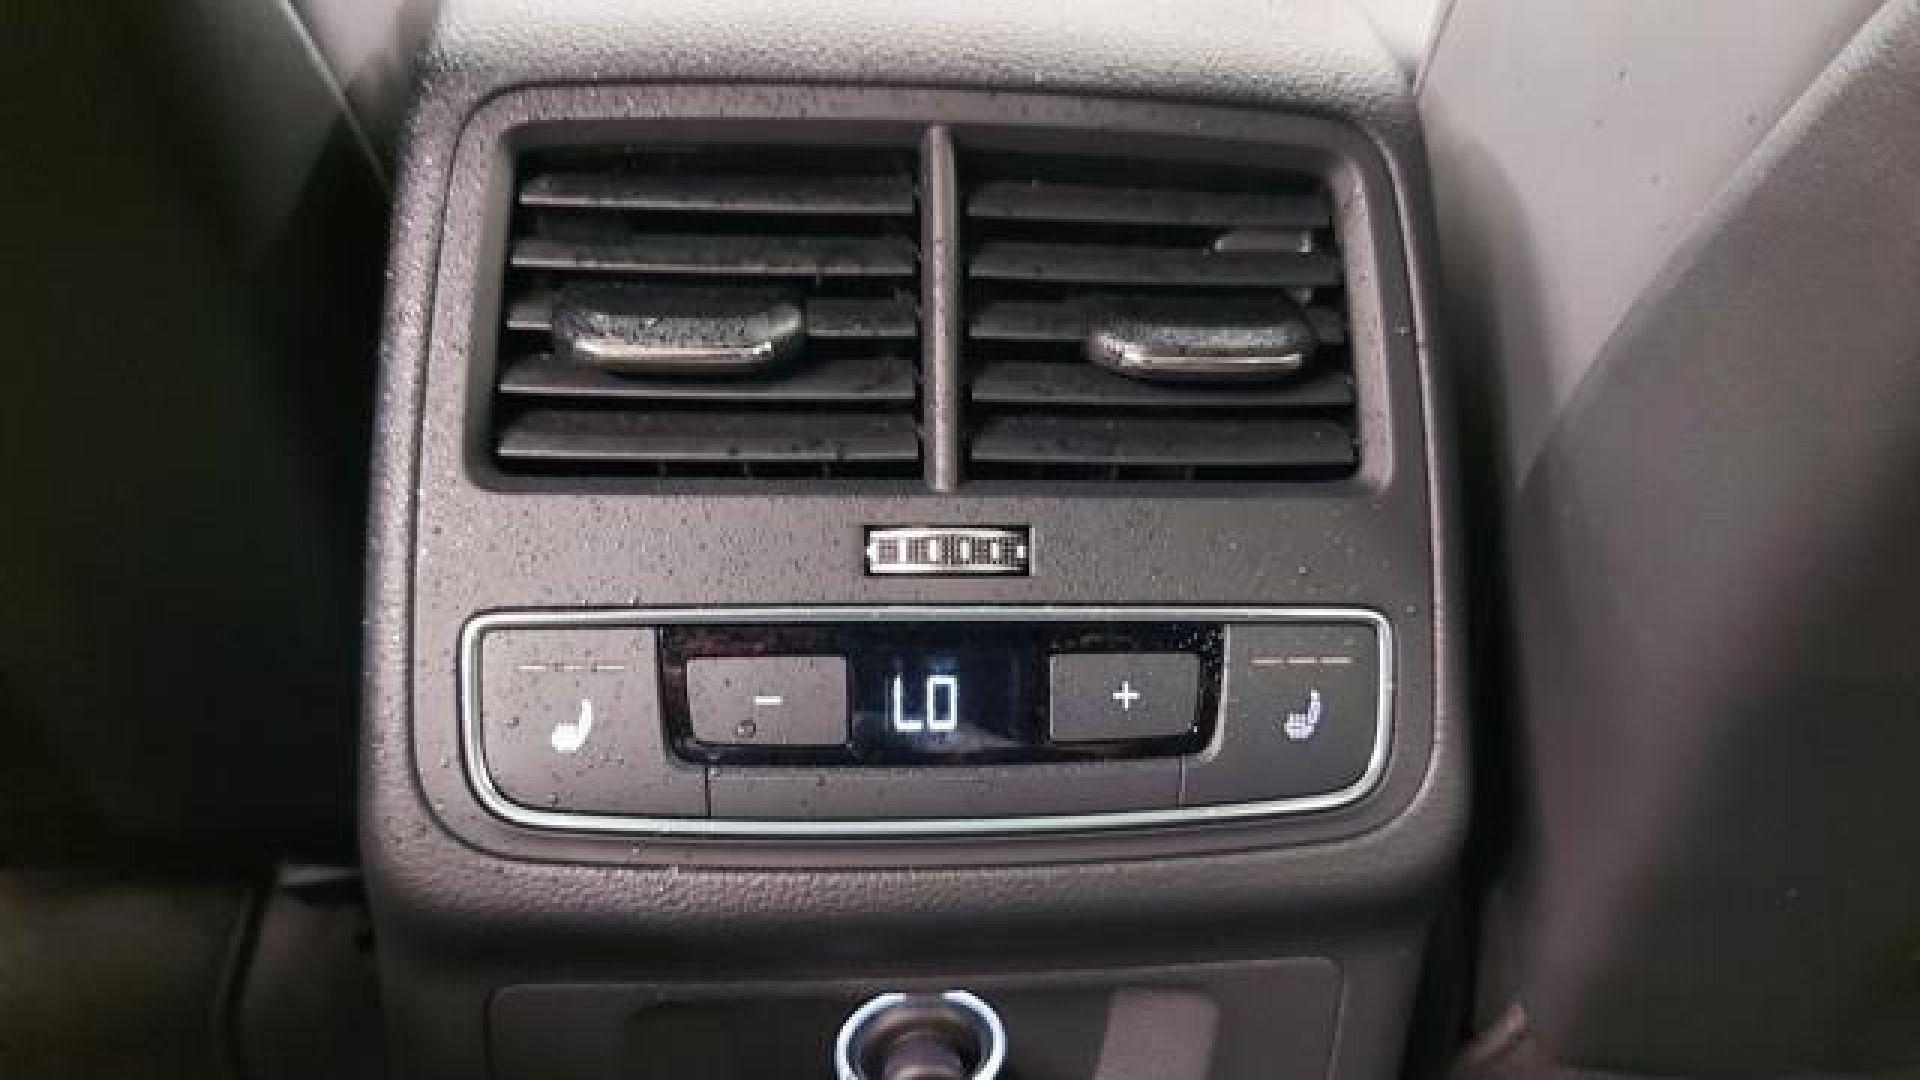 Audi A4 Avant S line 40 TFSI 140kW S tronic